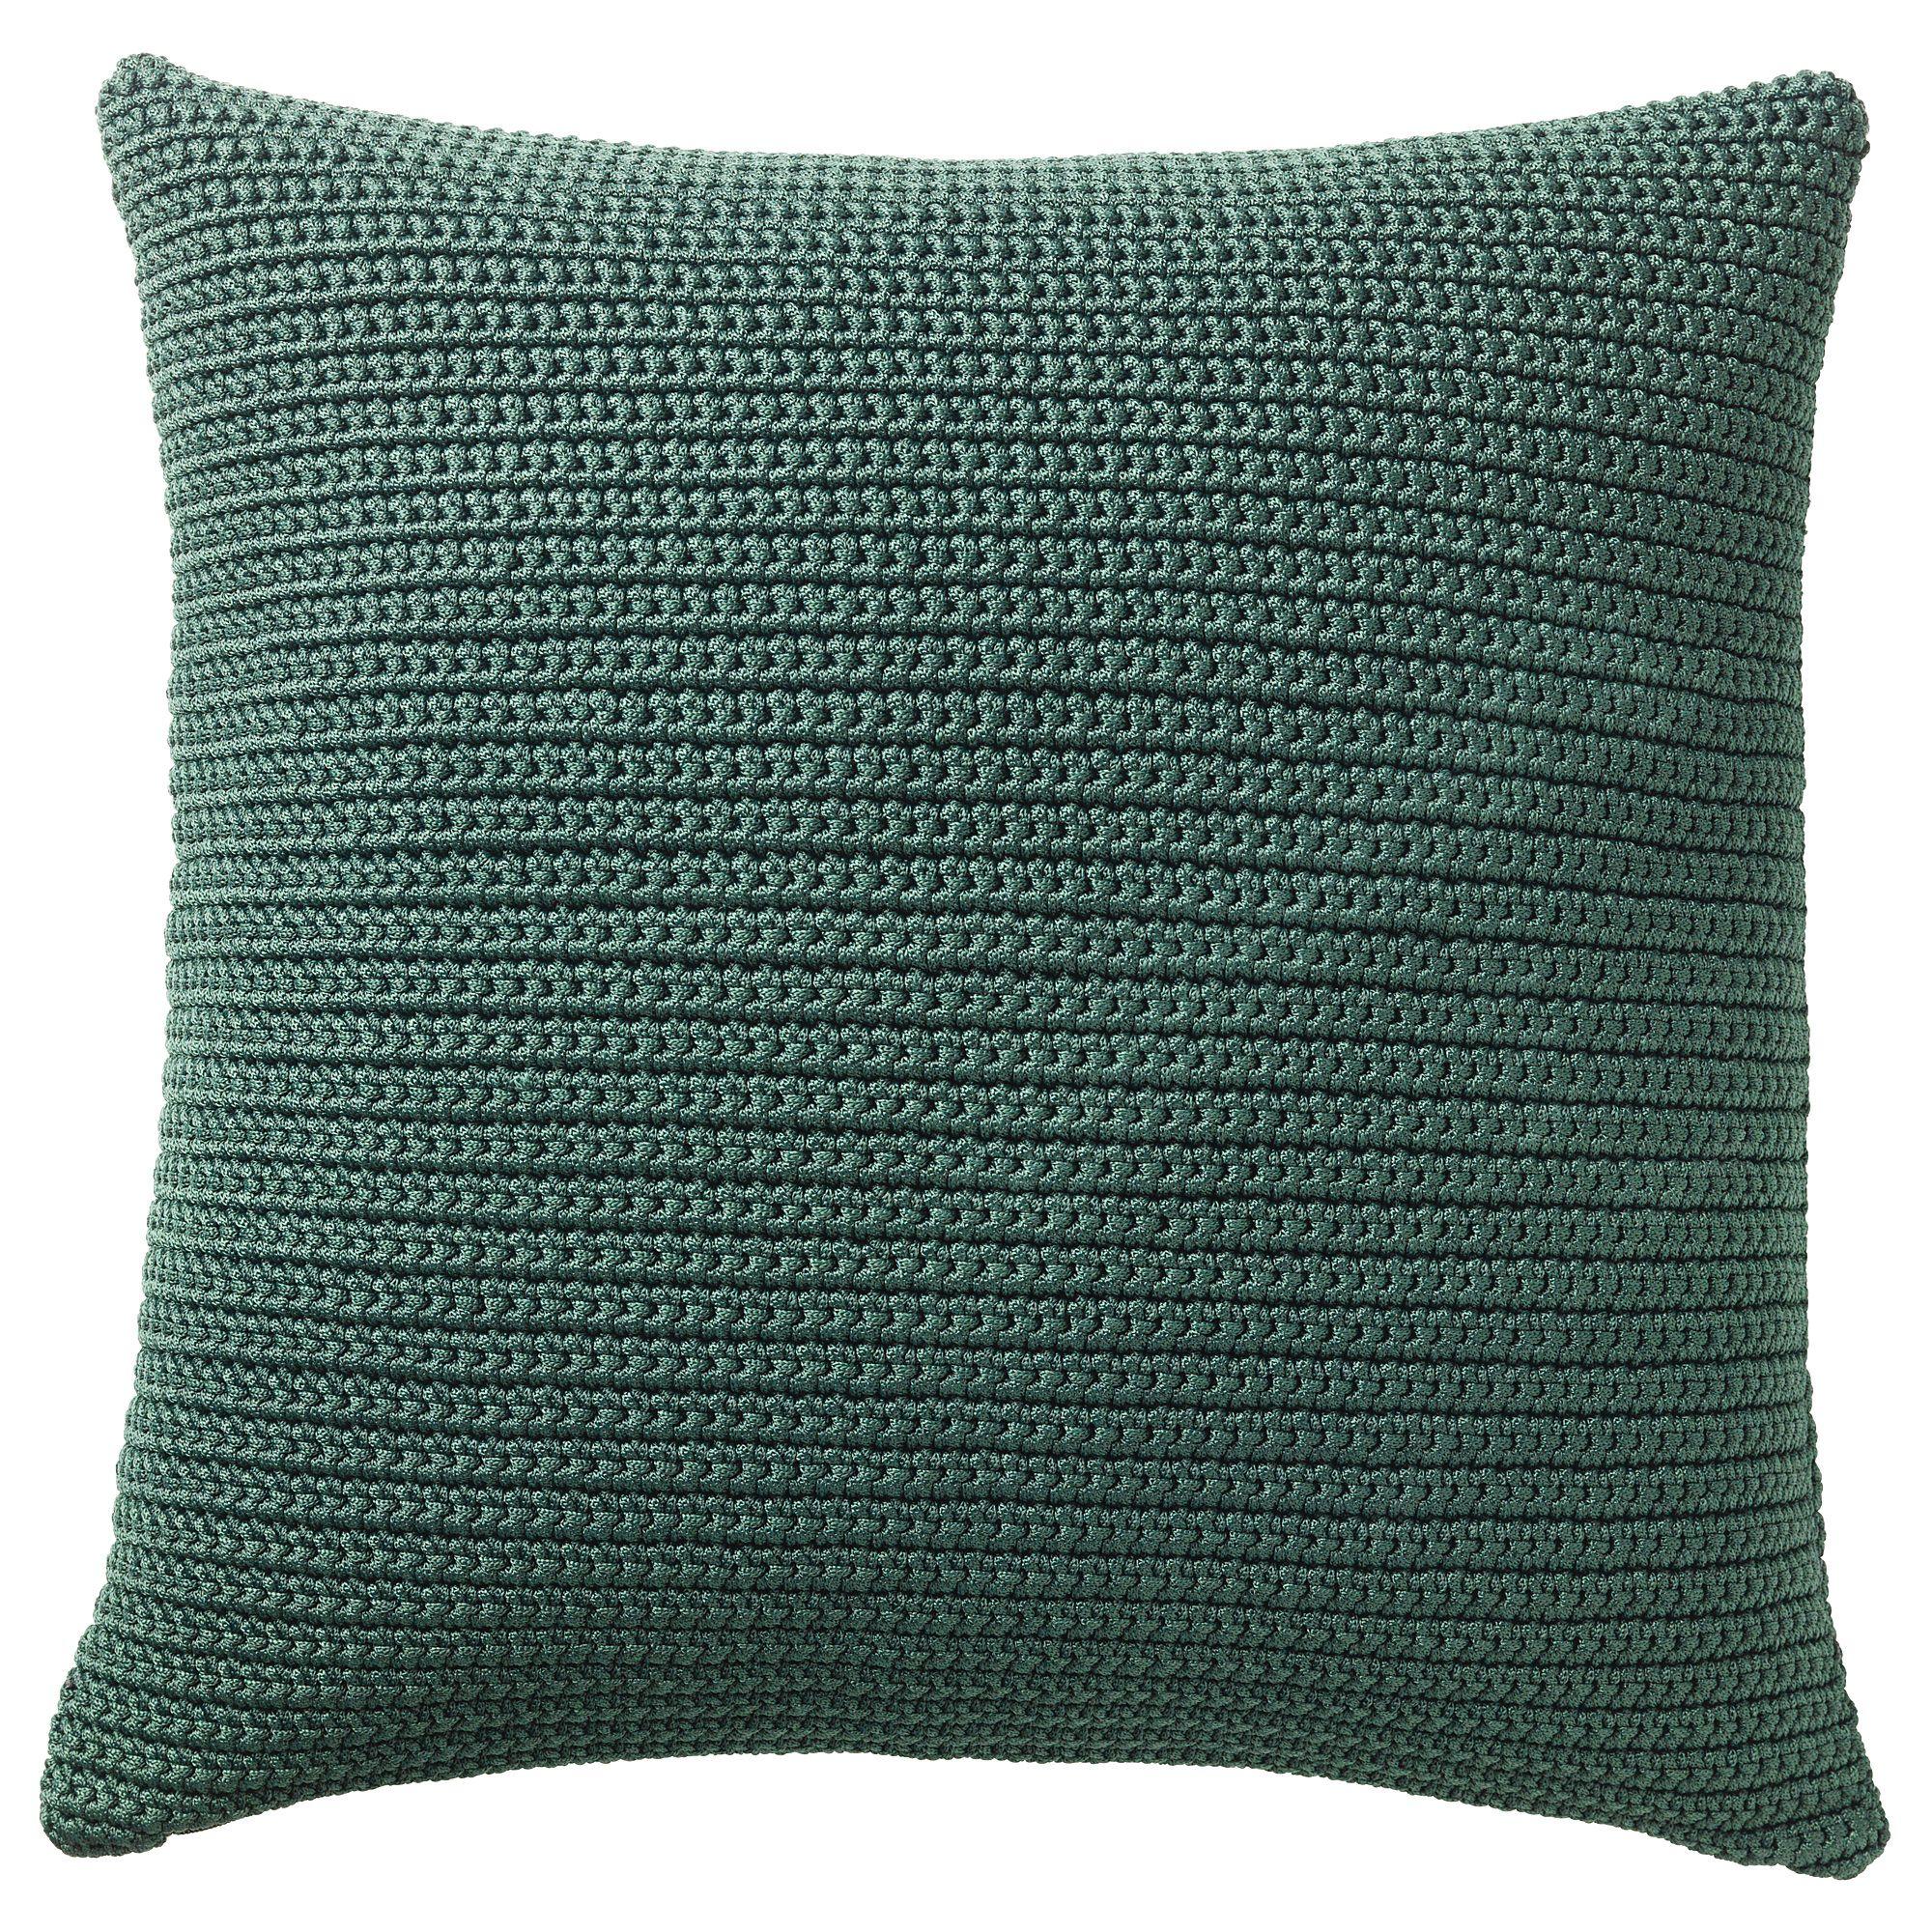 Kissen 45x45 Ikea.Sötholmen Cushion Cover Indoor Outdoor Dark Green Házi